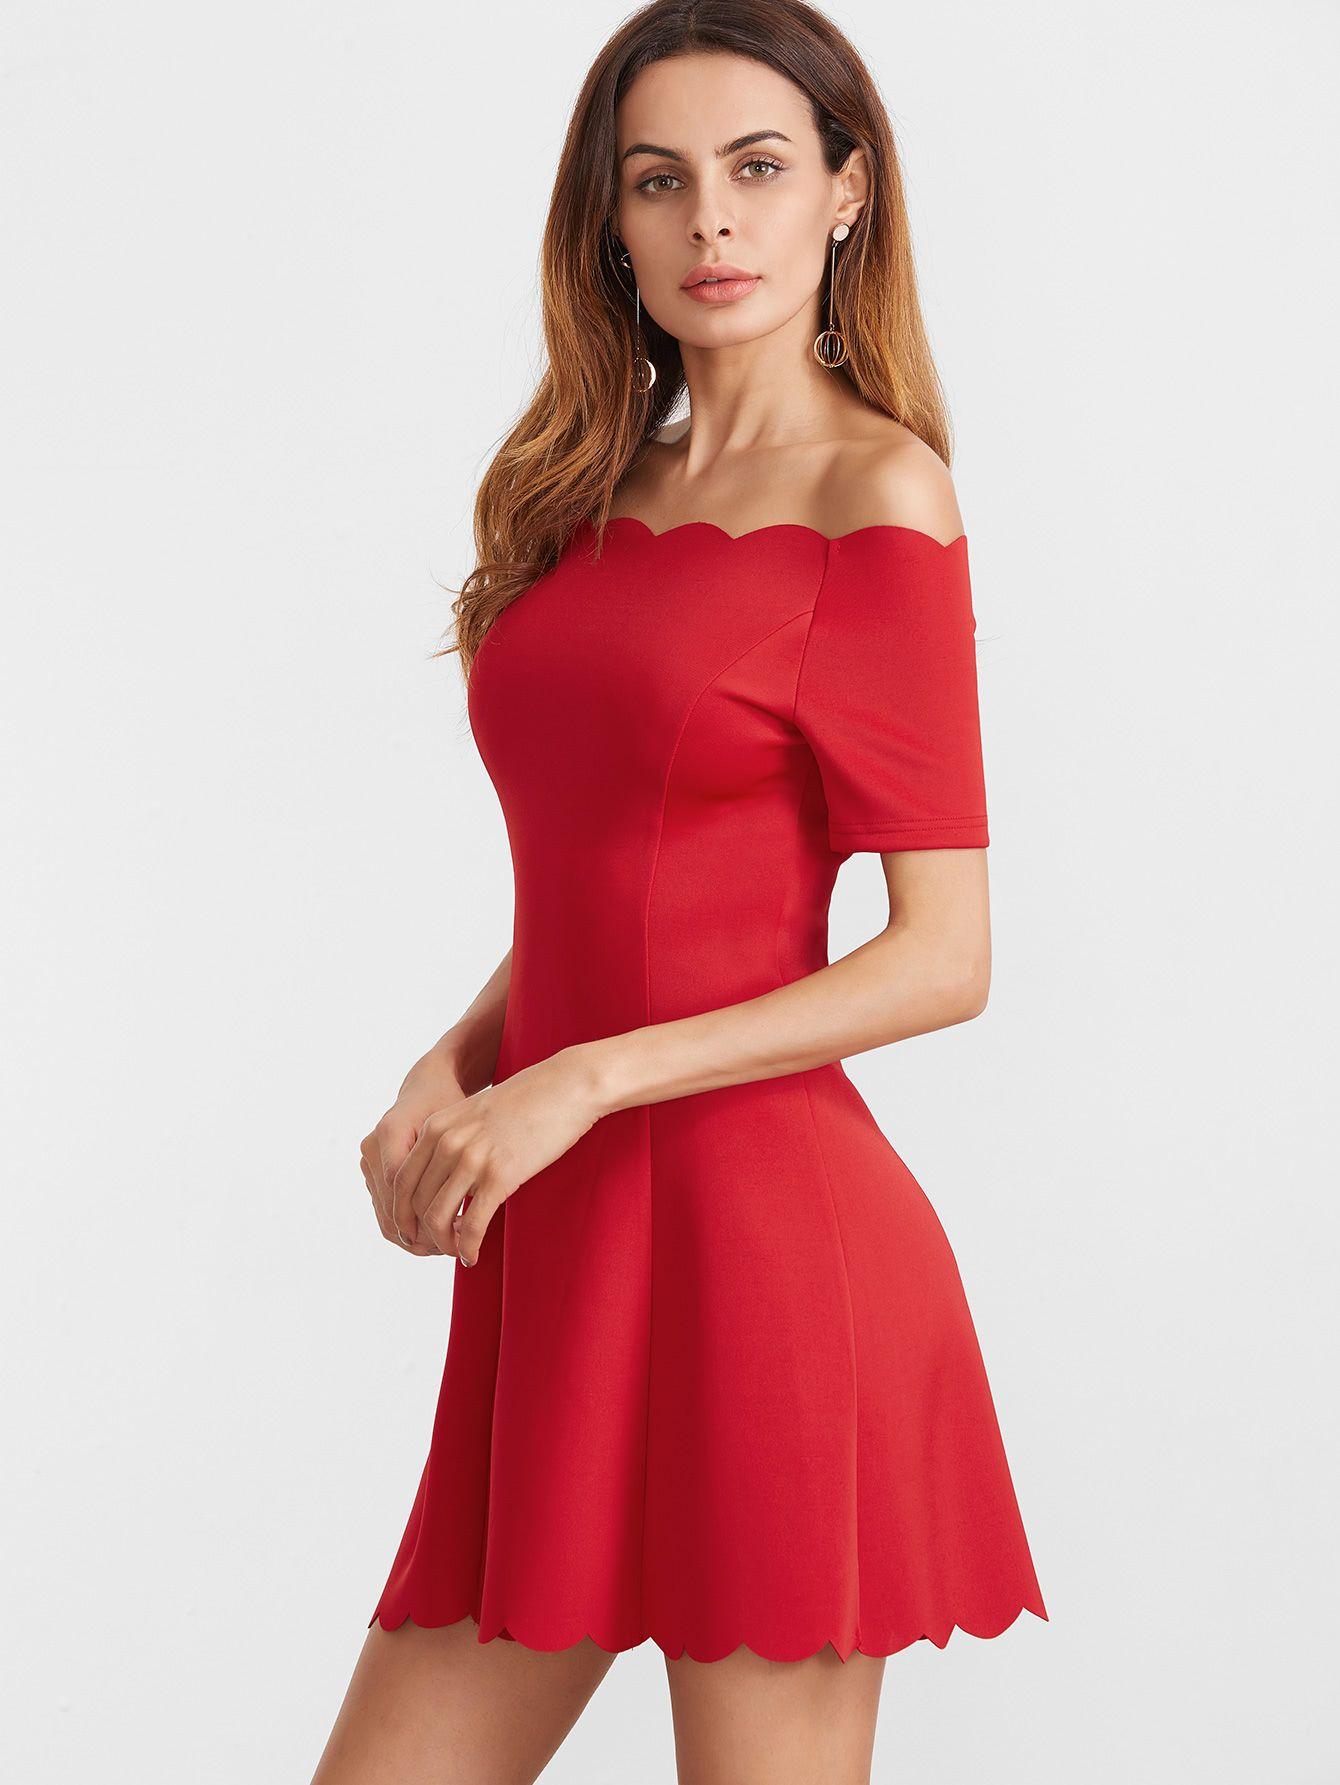 a5d916aadb Mayura Red Off Shoulder Dress. SheIn Scallop Edge Bardot Neckline Fit And  Flare Dress - $14